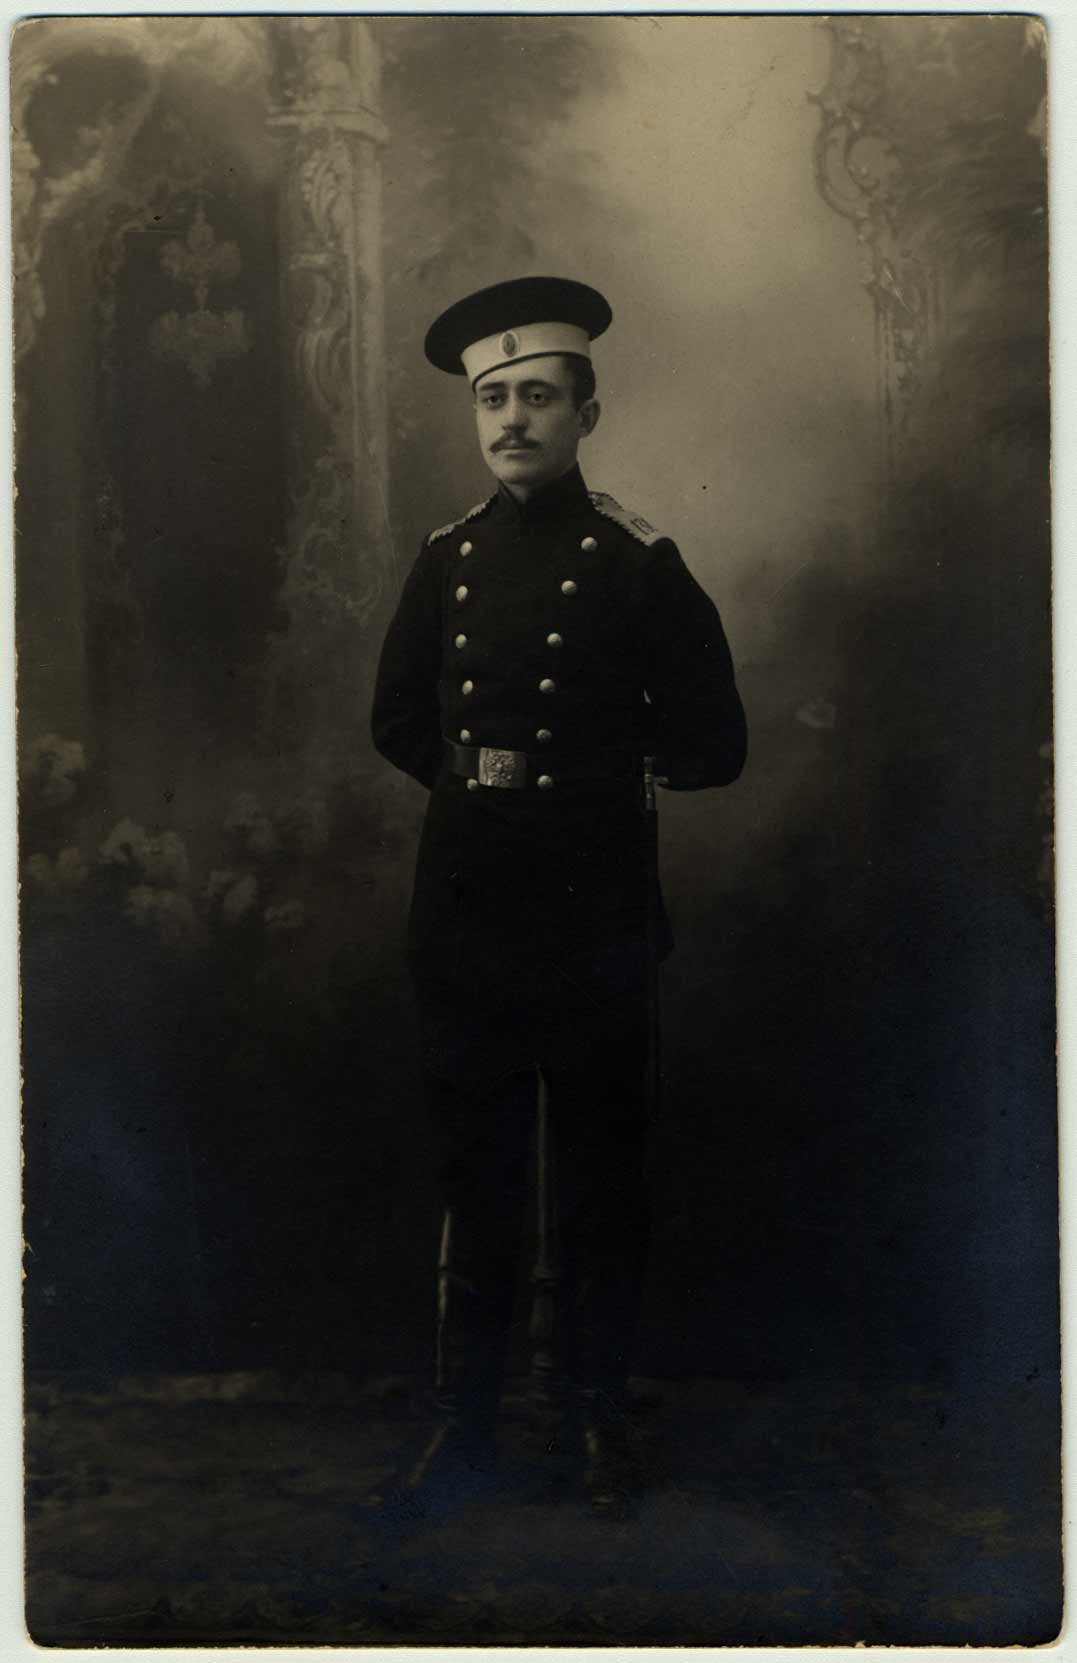 Le mari de Ginda, Abraham Rosenblatt, photographié en uniforme en 1917.